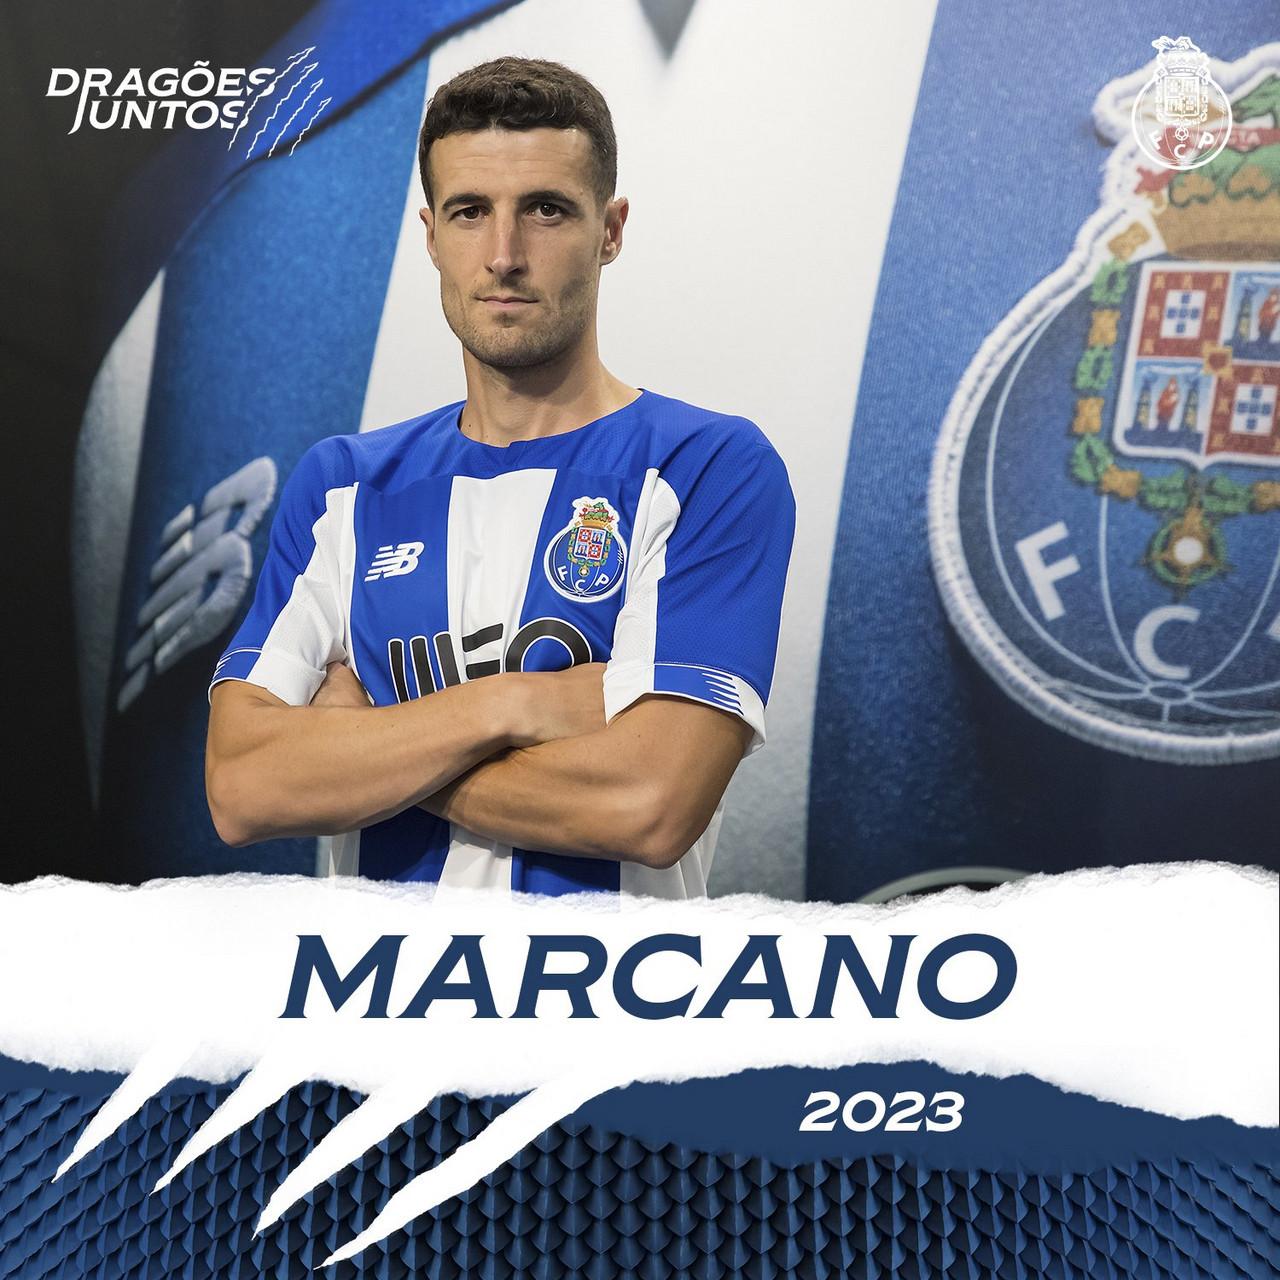 Marcano de regresso ao Porto